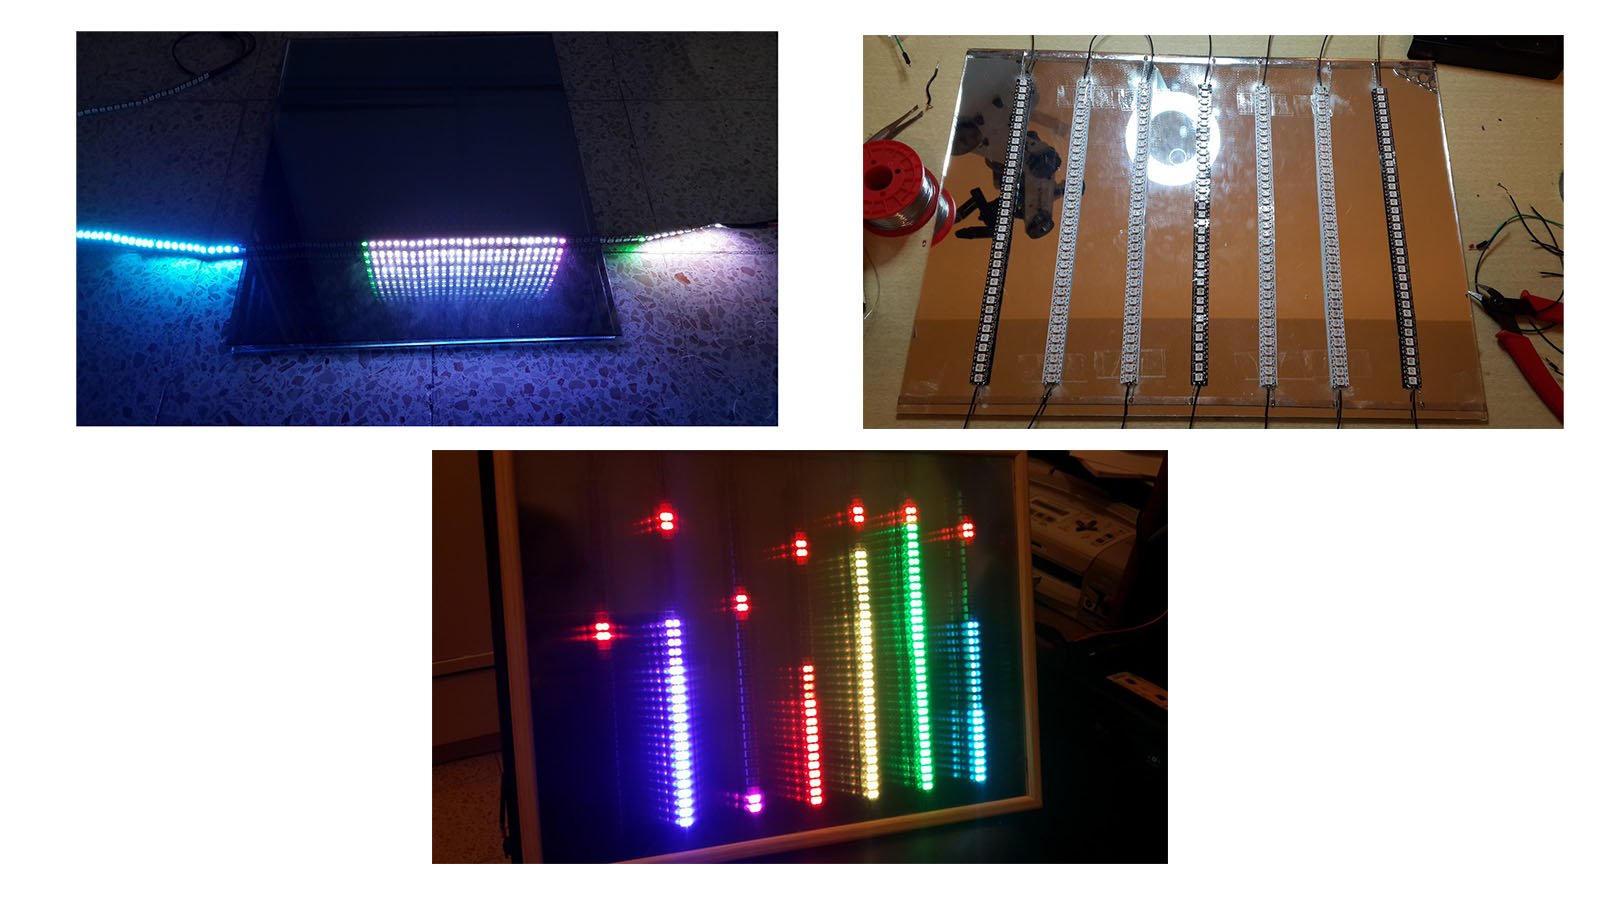 Part 2 - Spectrum Analyzer with ESP8266, MSGEQ7, WS2812 and